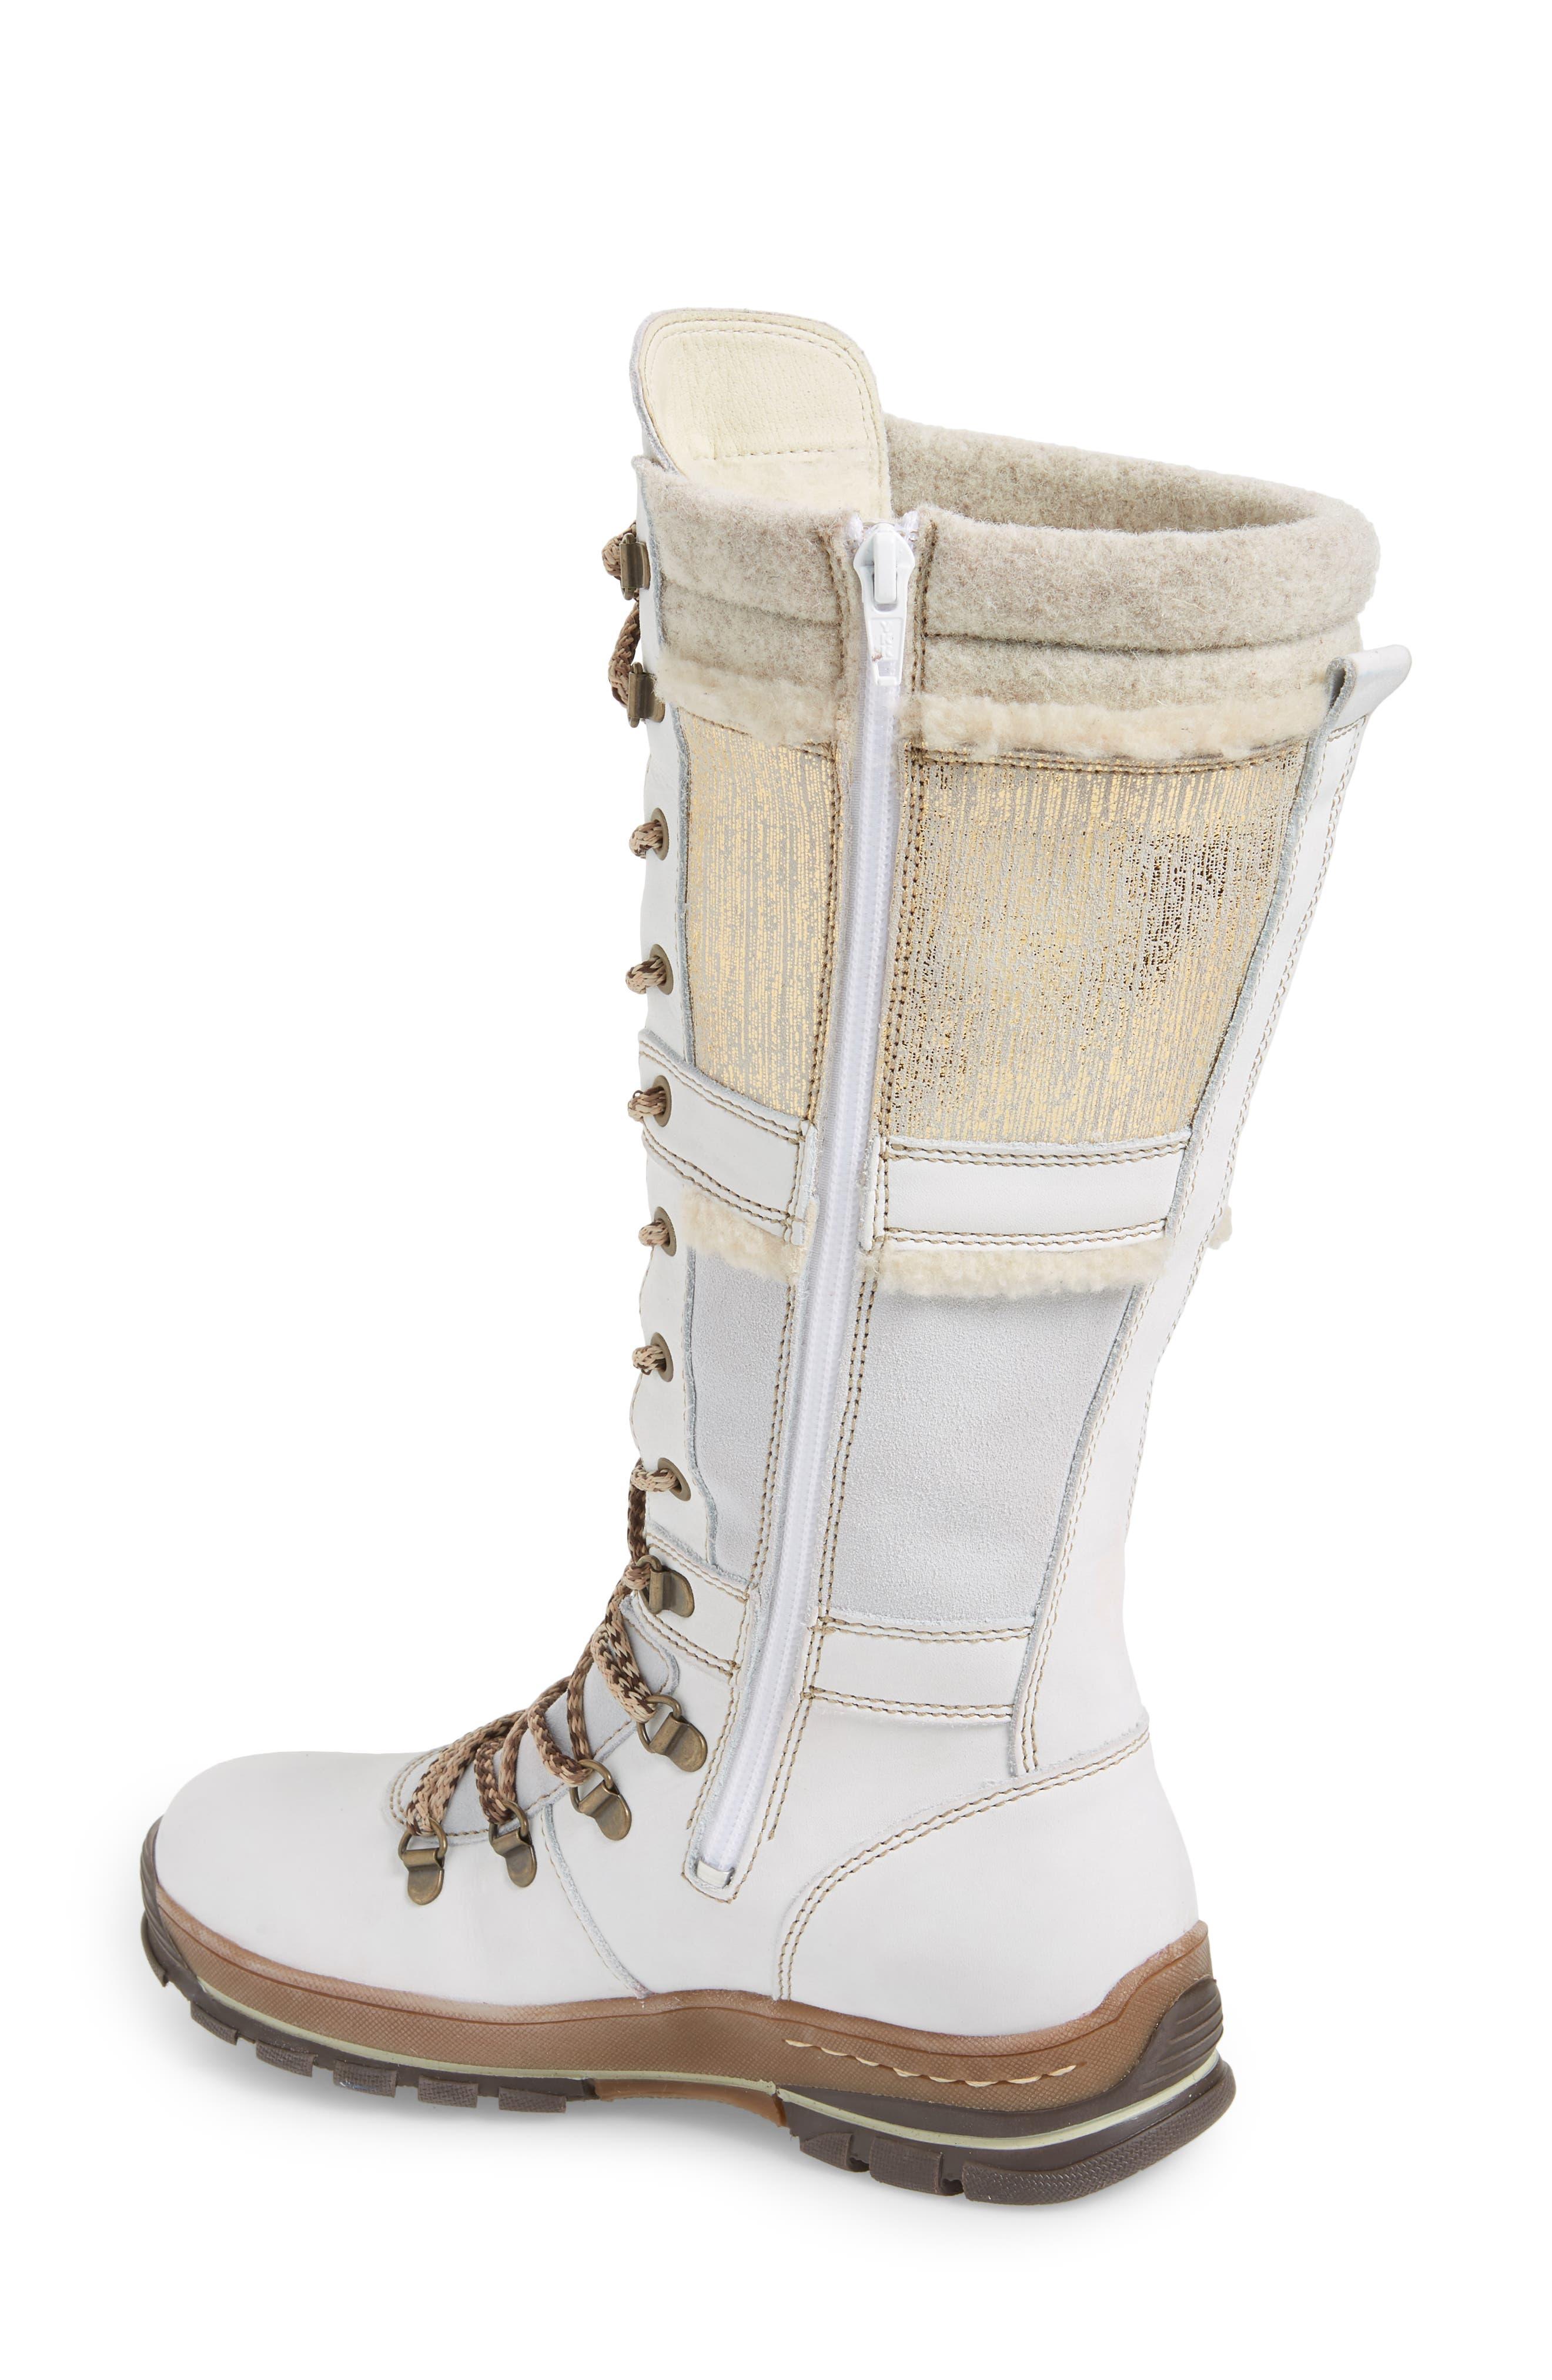 09b77f36d1406 Women s Bos.   Co. Boots